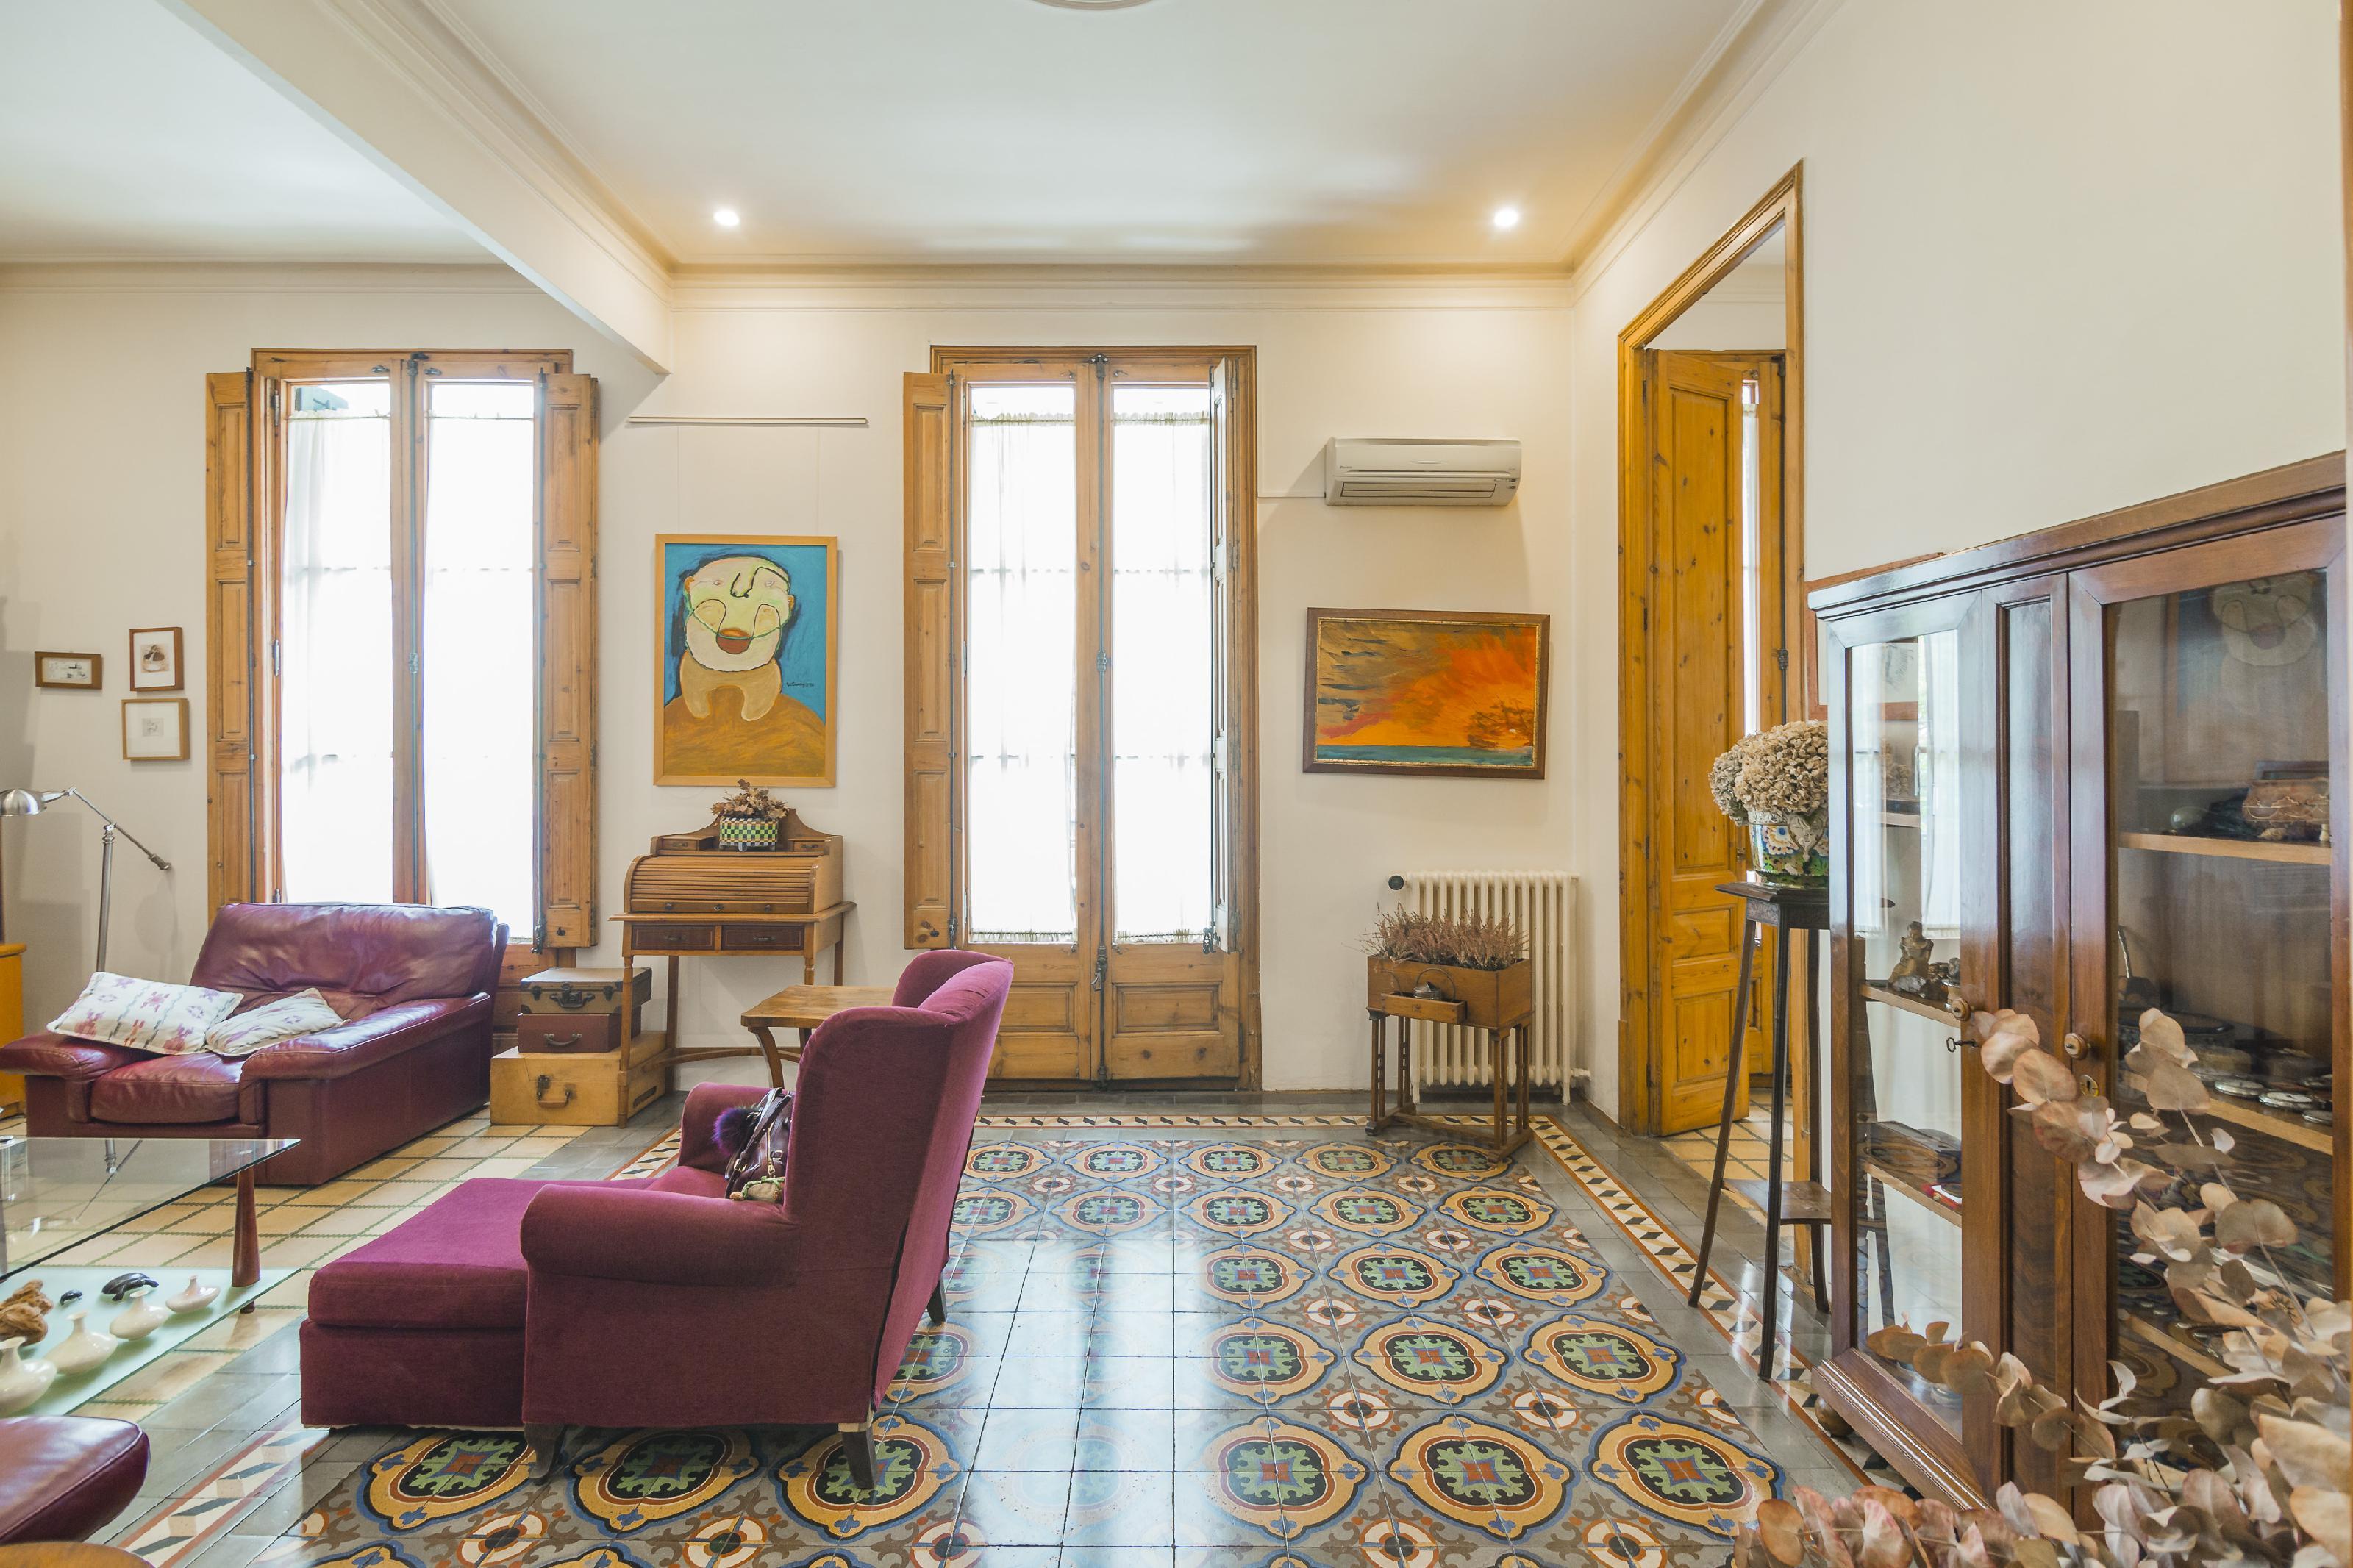 250020 Piso en venda en Gràcia, Vila de Gràcia 36